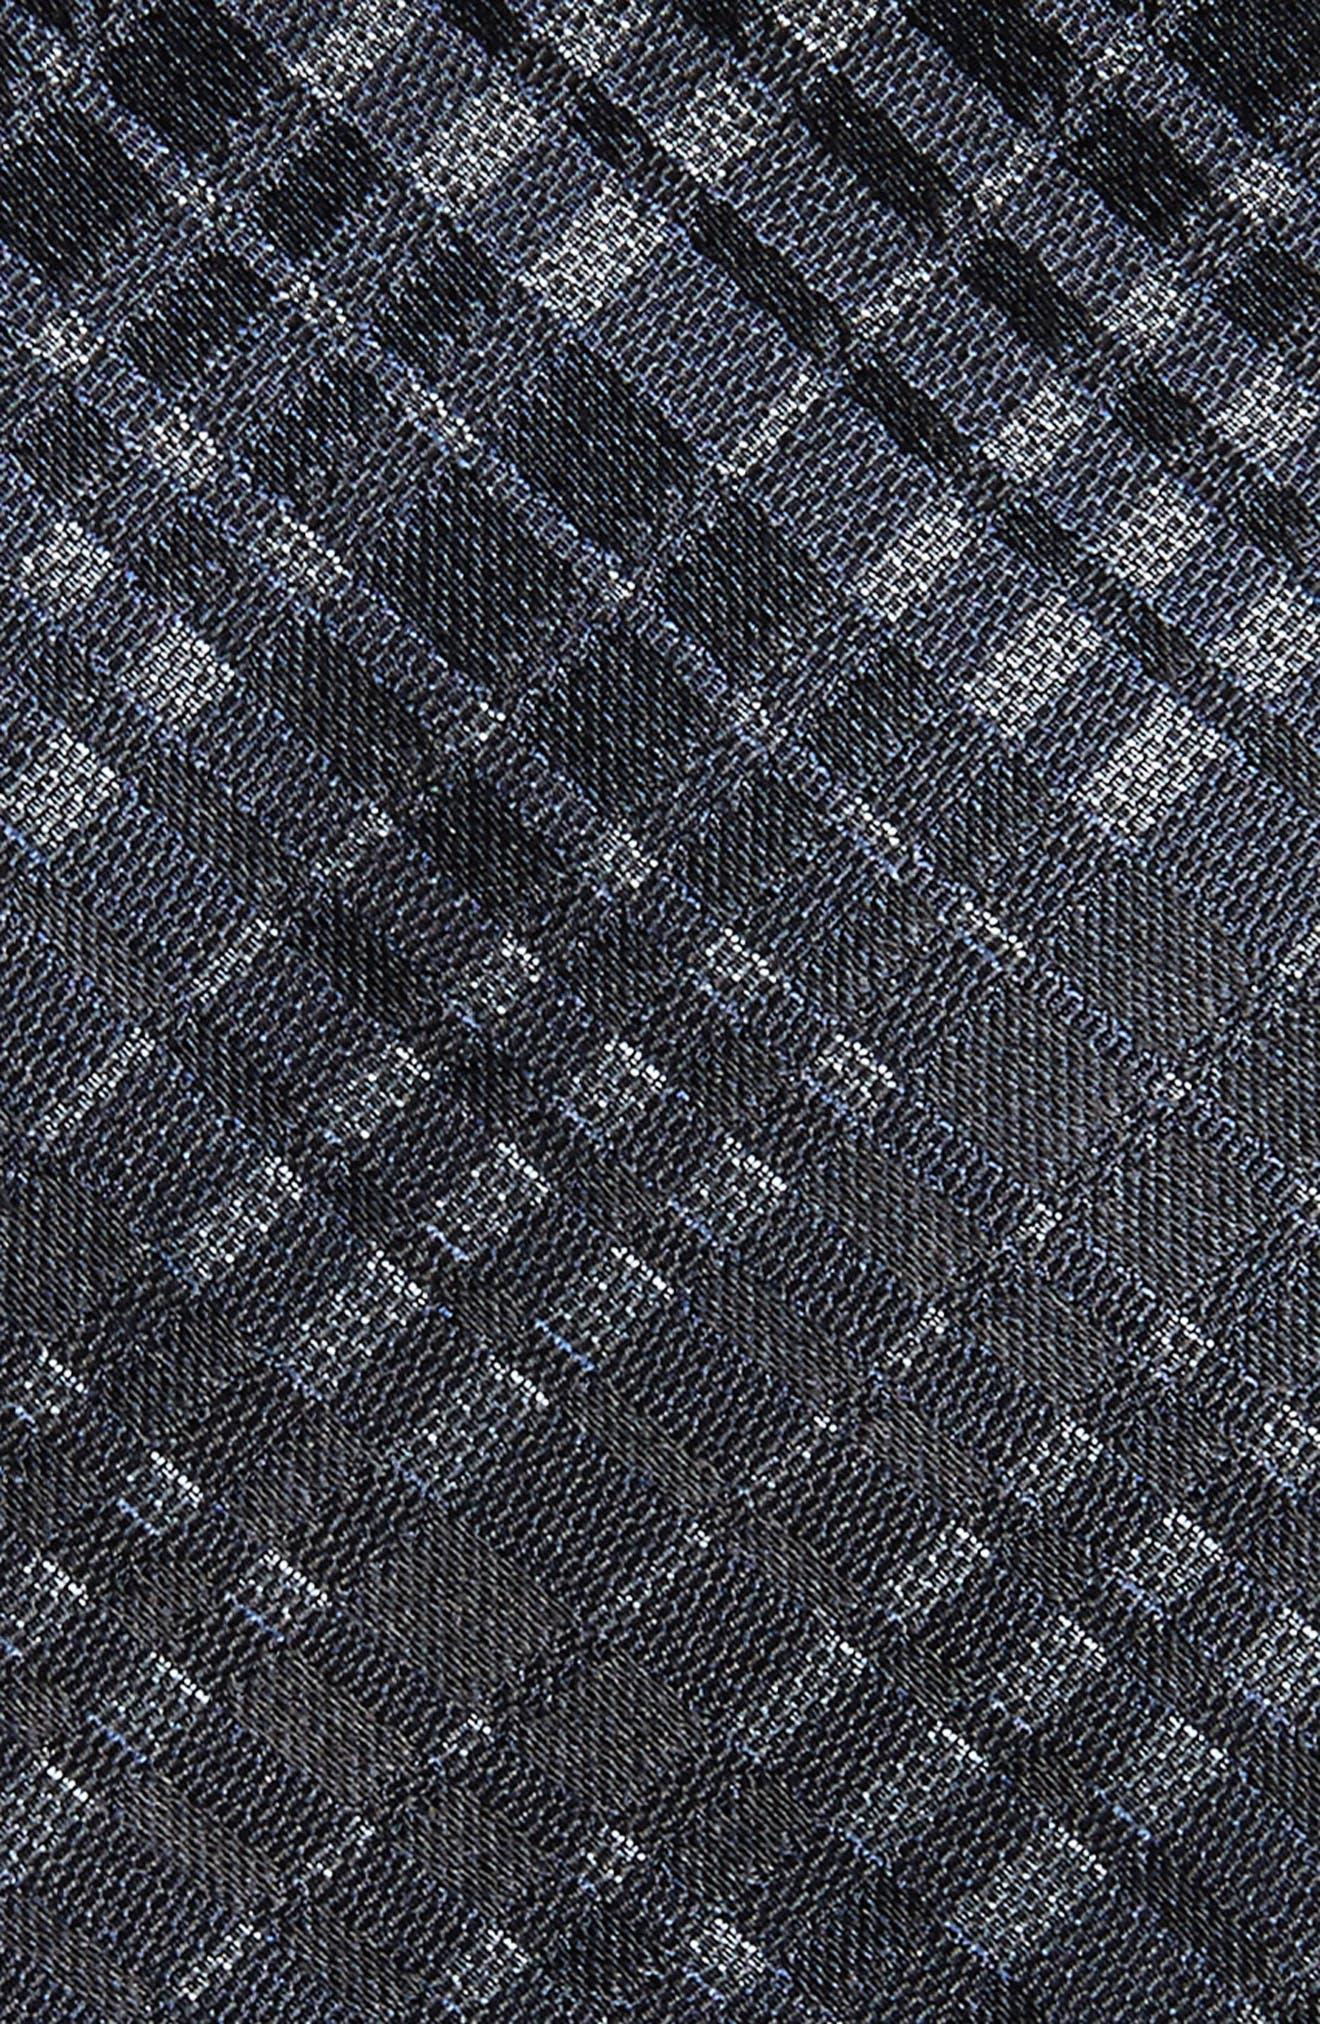 Plaid Silk Tie,                             Alternate thumbnail 2, color,                             410